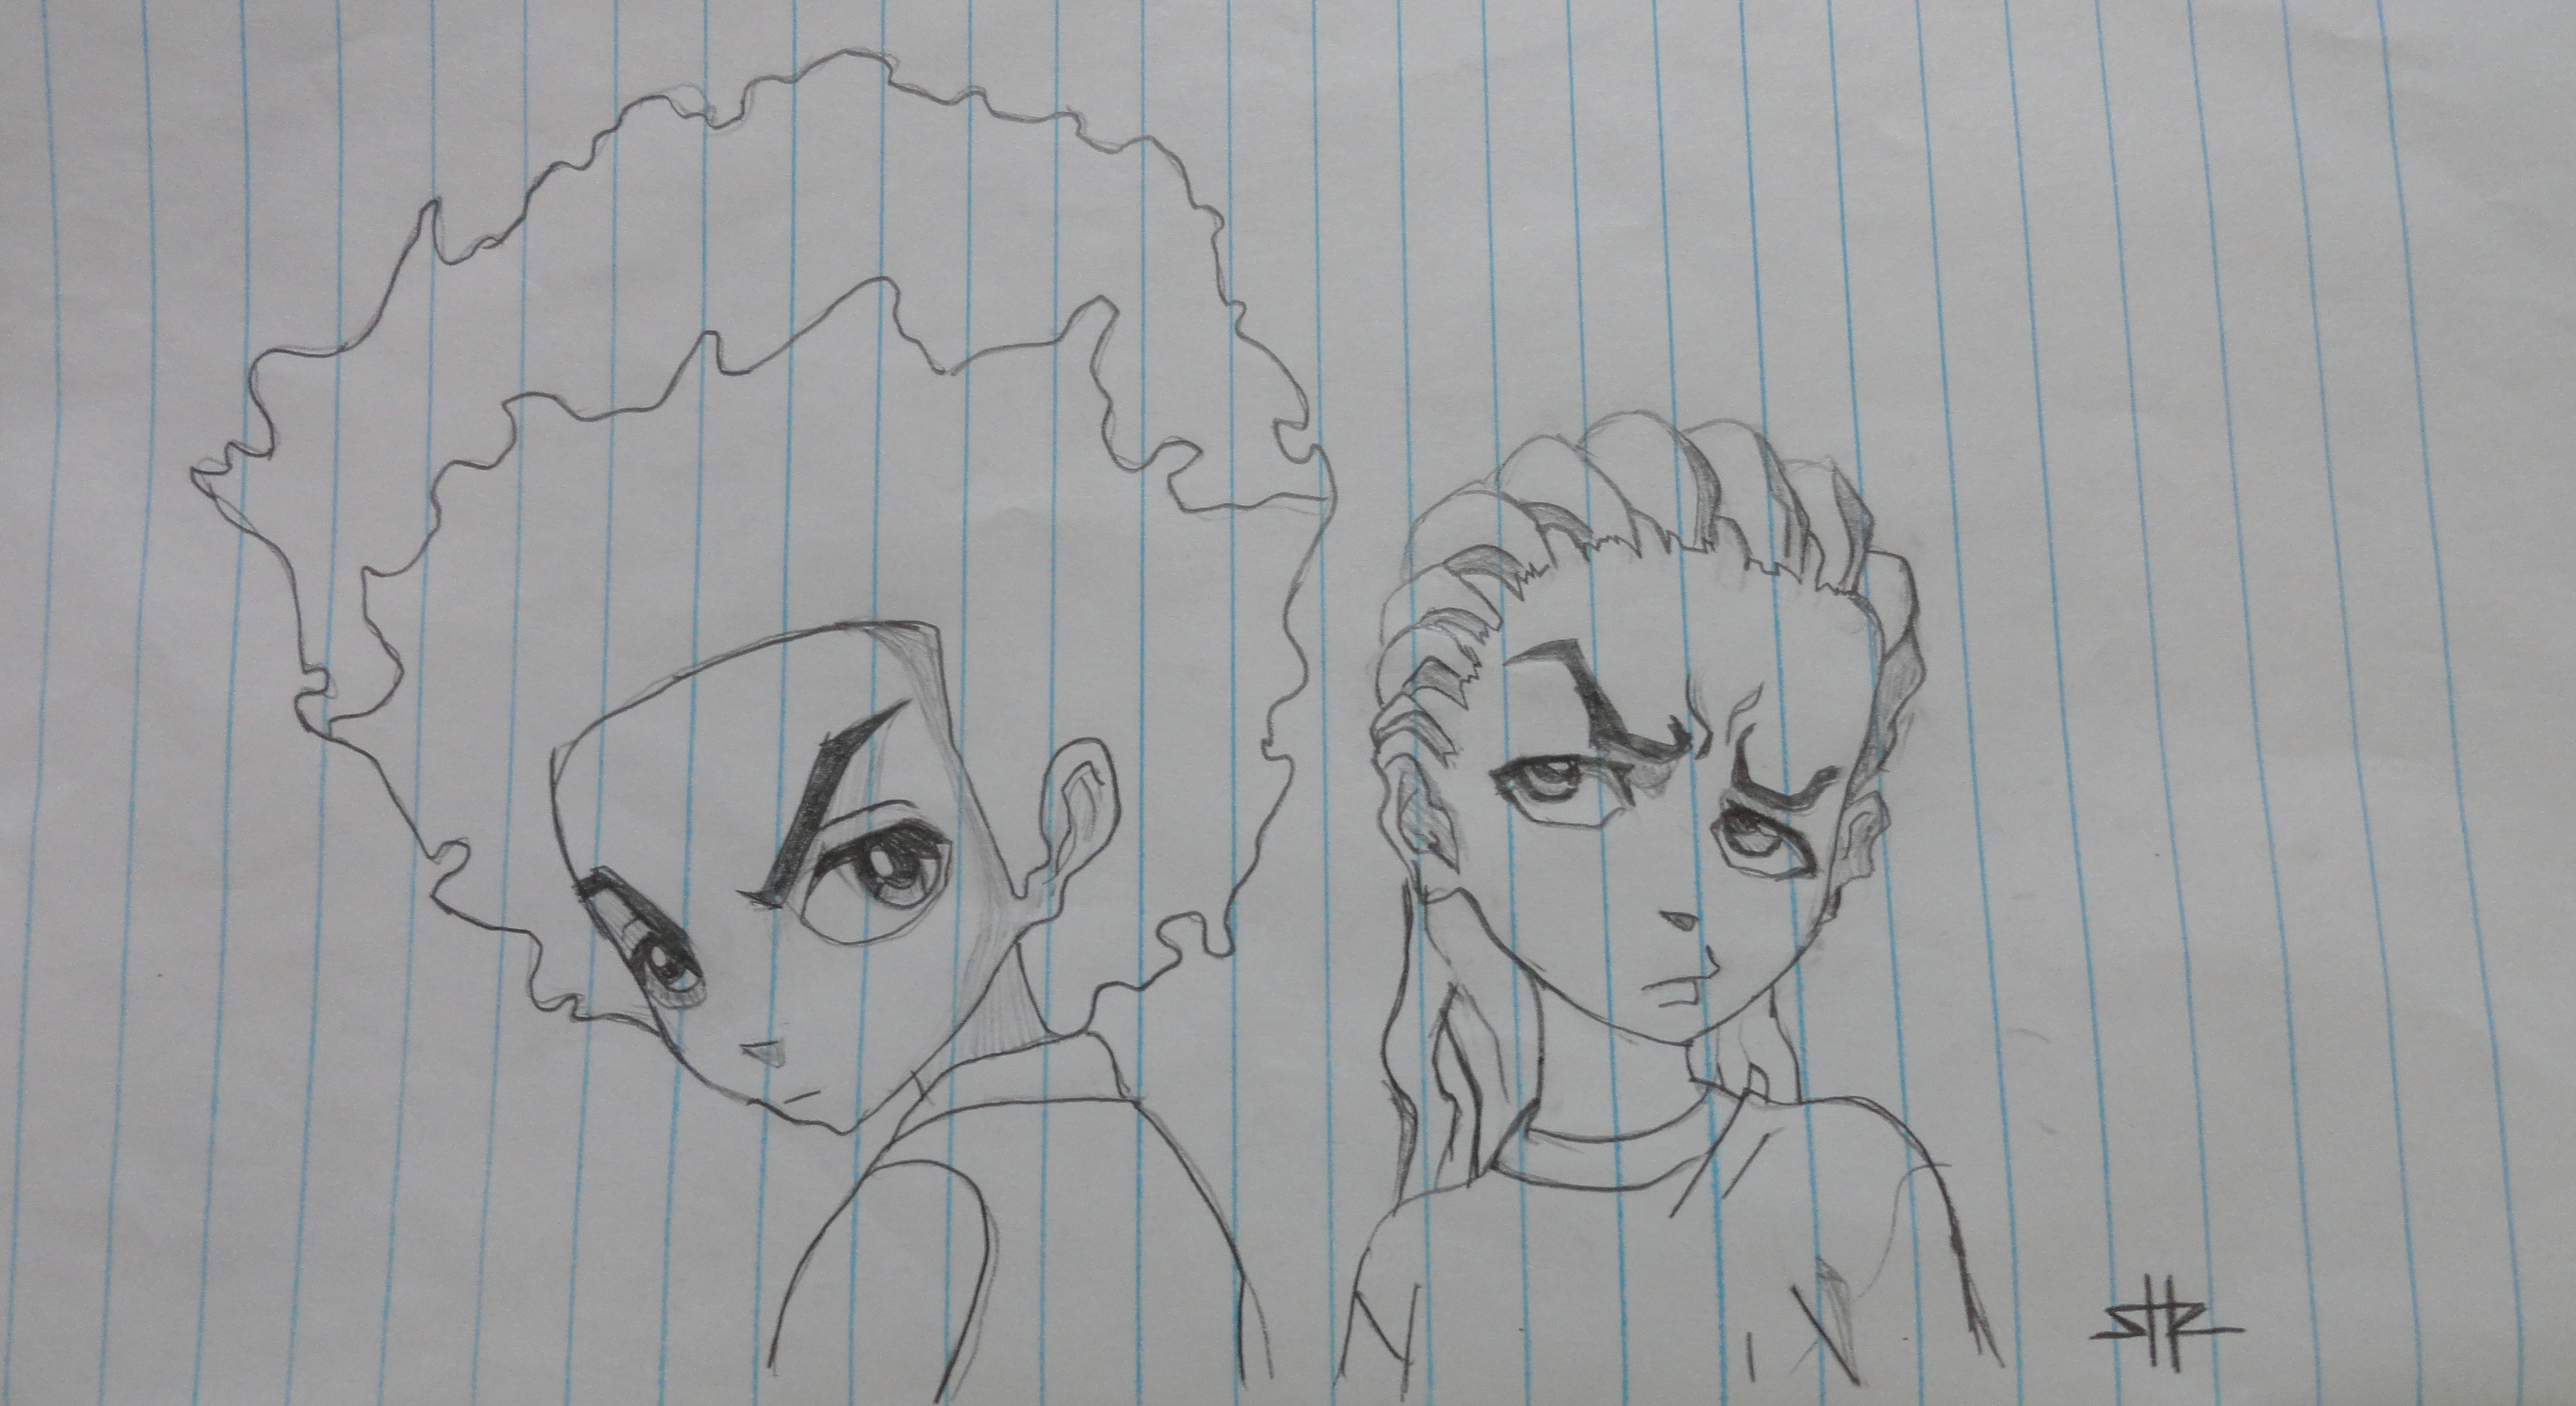 Huey And Riley Freeman By Thn1105 On Deviantart